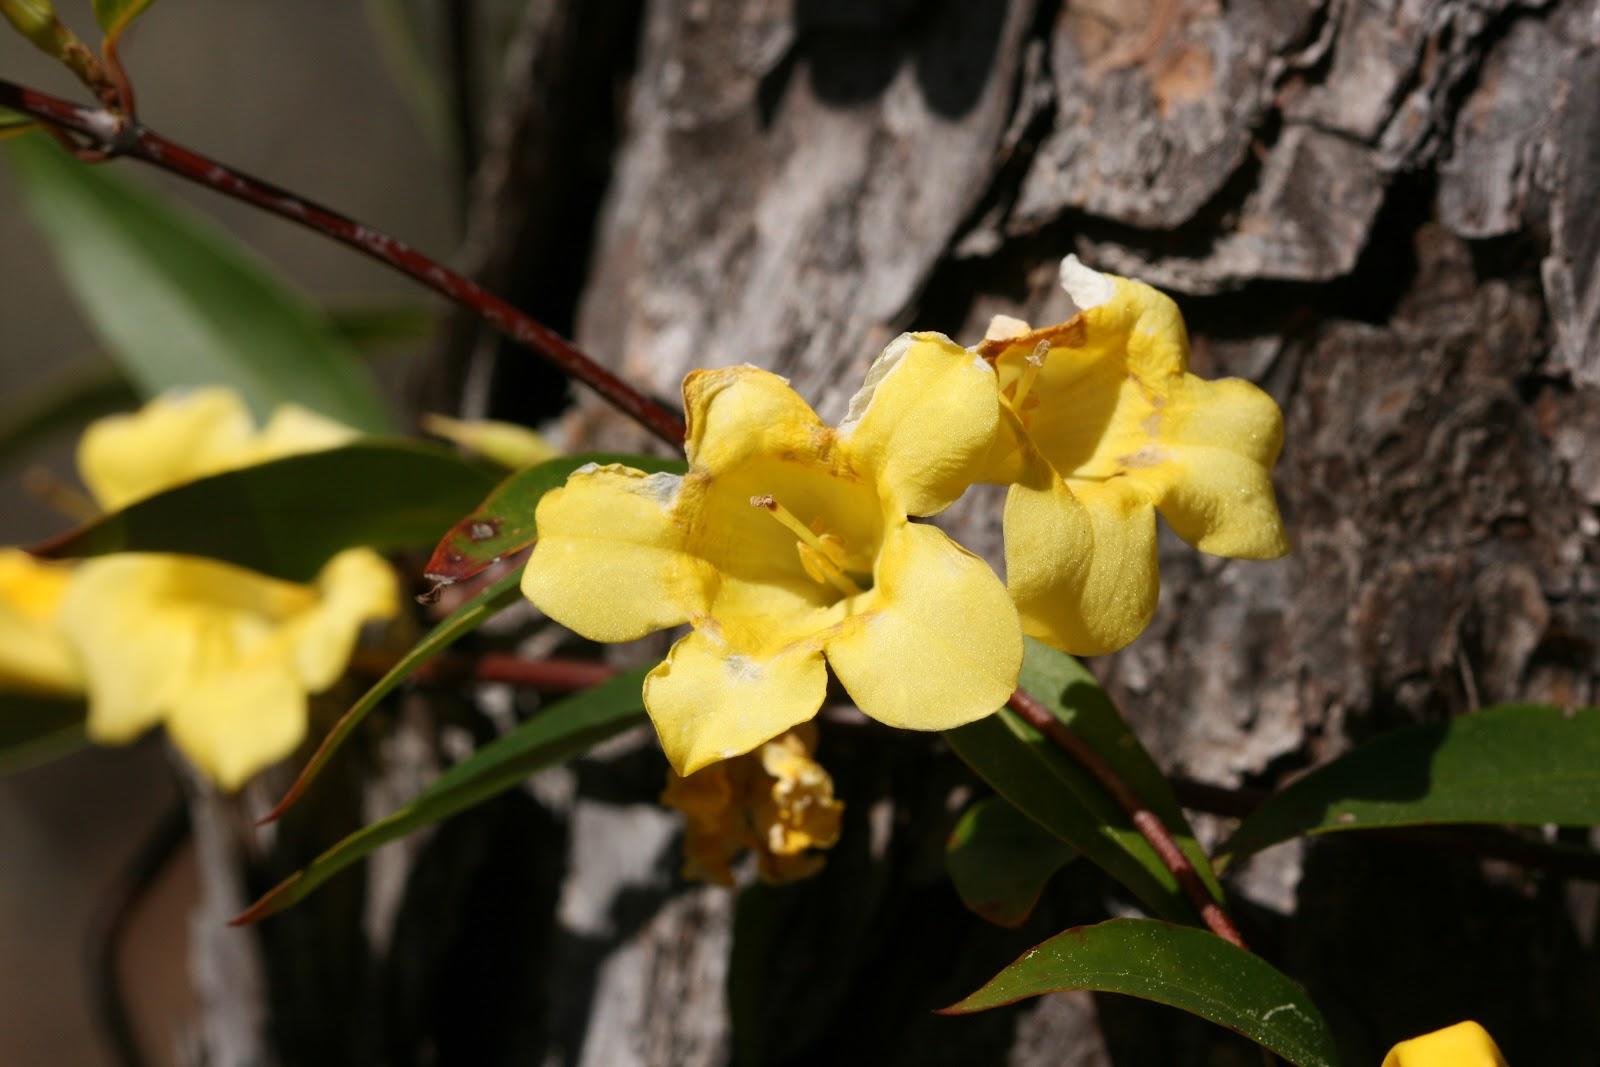 Native Florida Wildflowers Yellowcarolina Jessamine Gelsemium